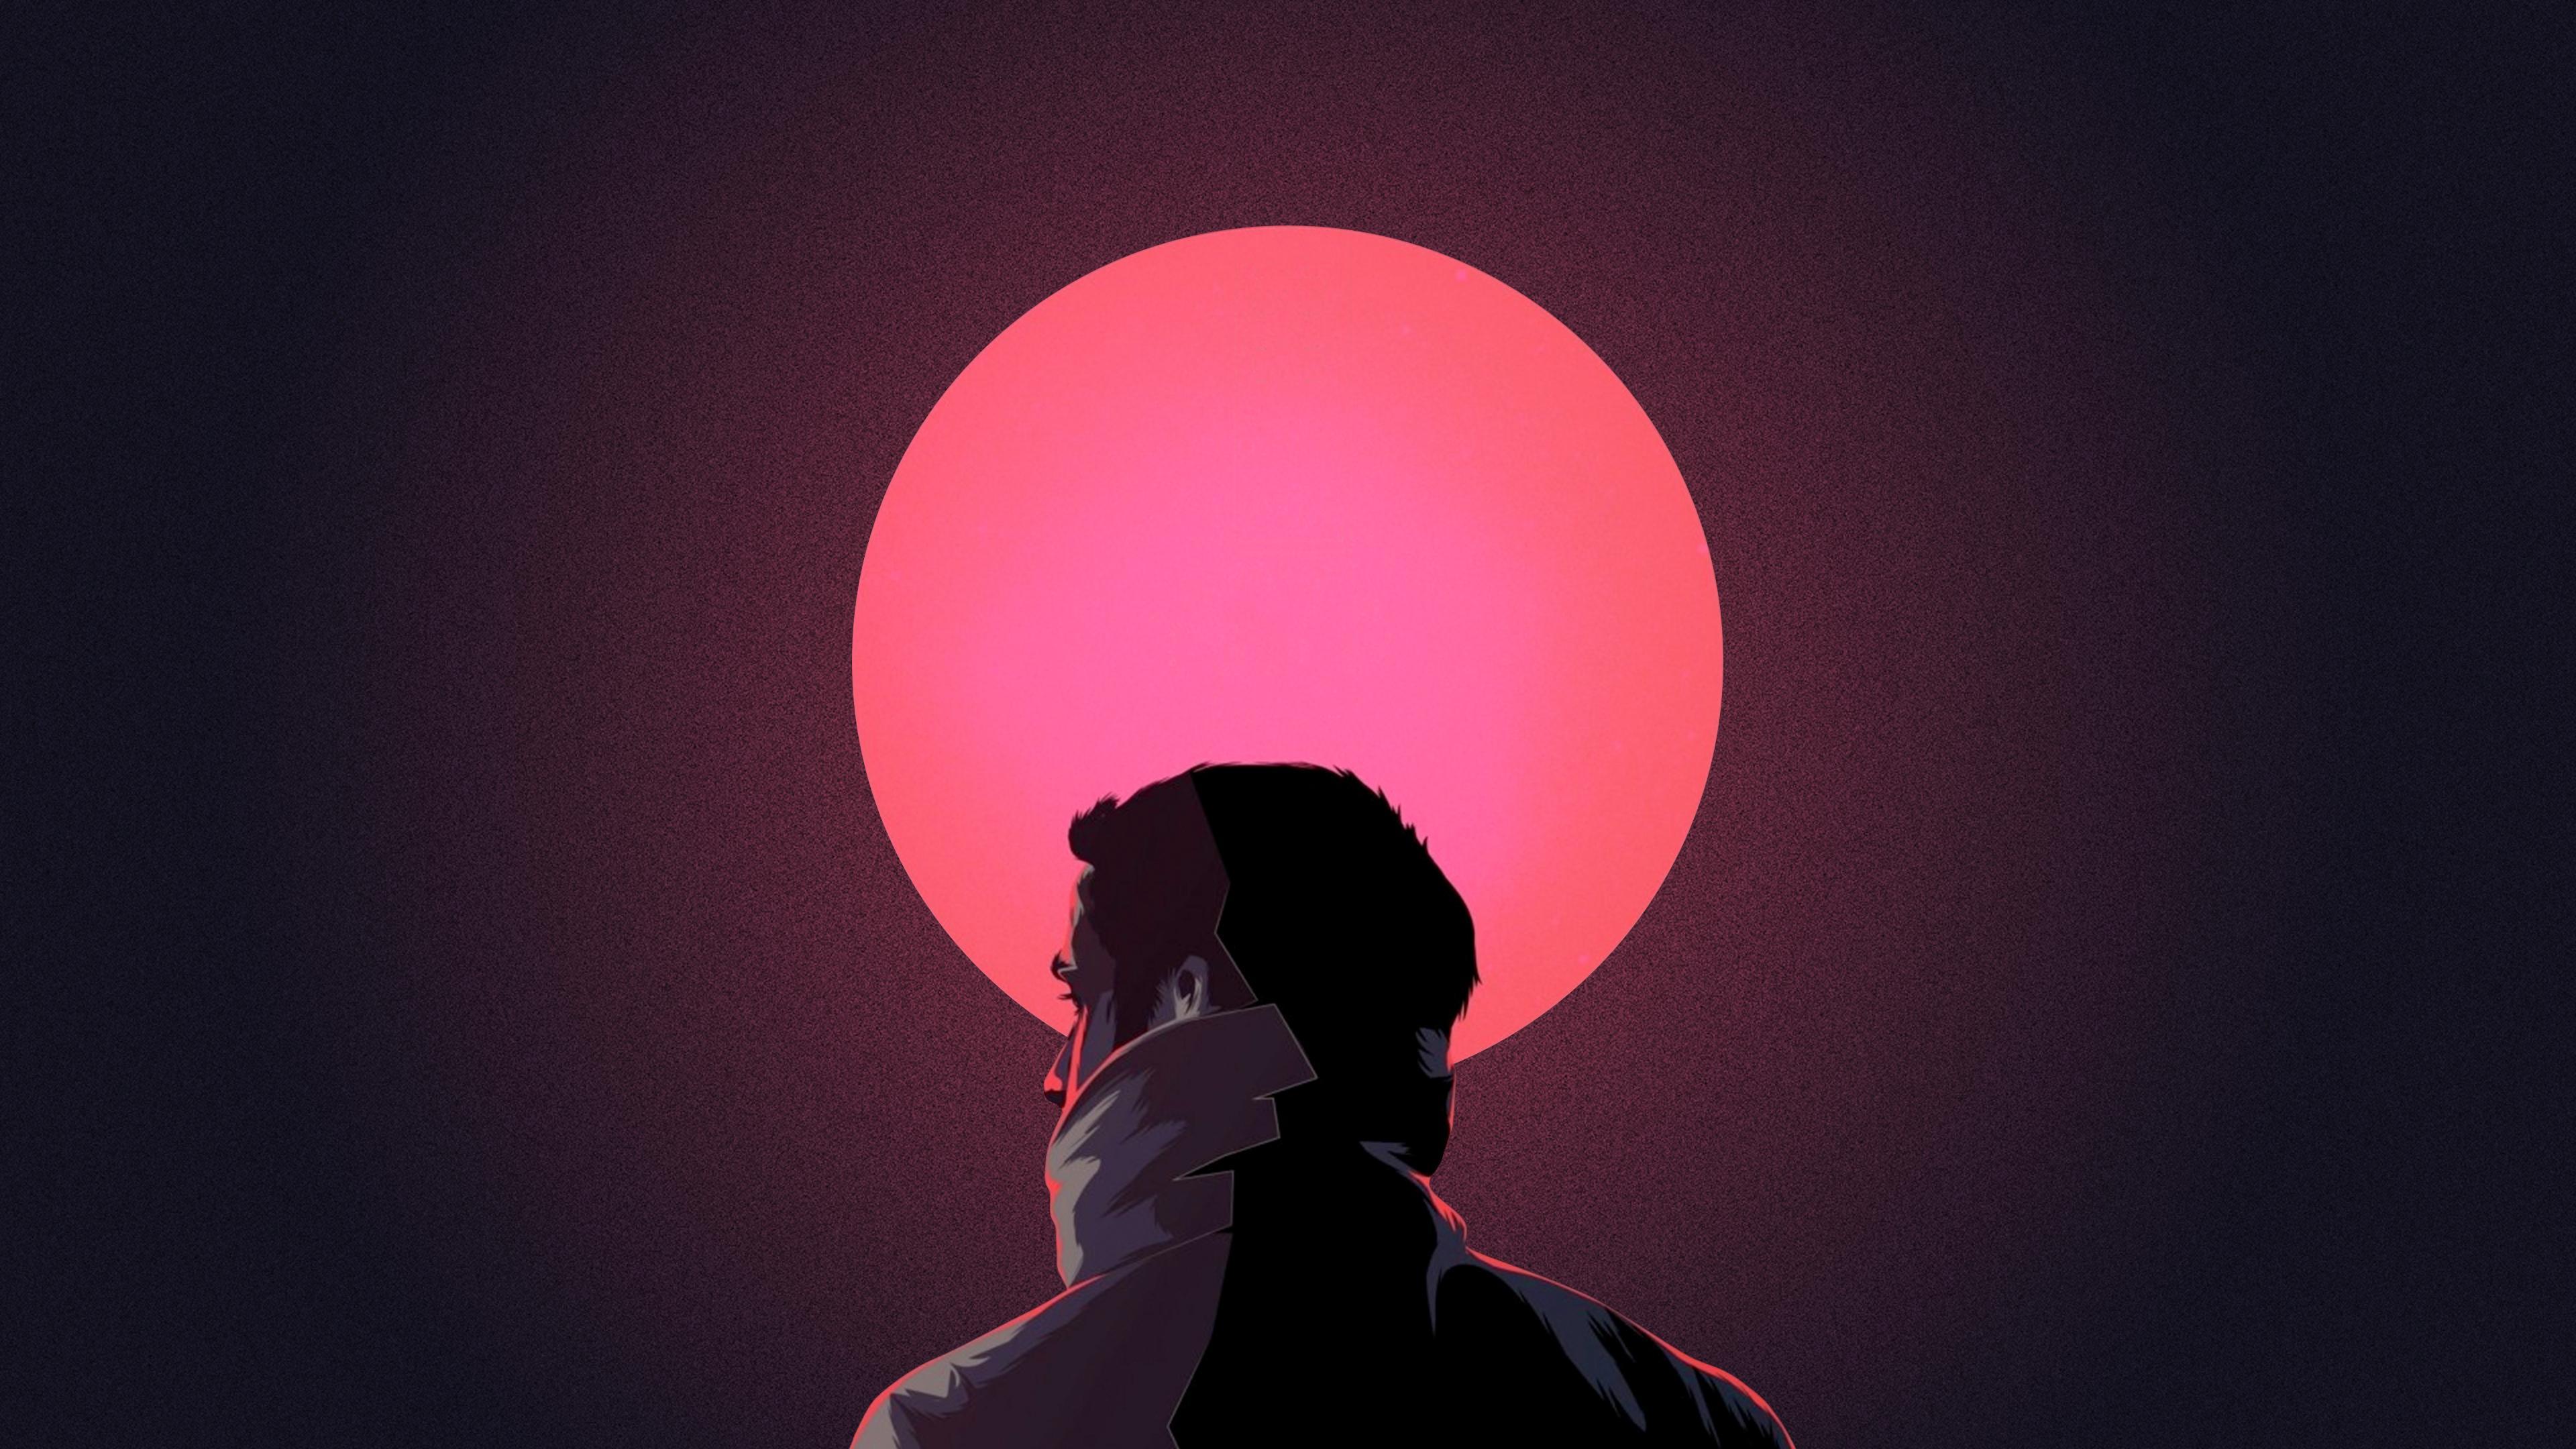 Blade Runner 2049 4k Ps4wallpapers Com